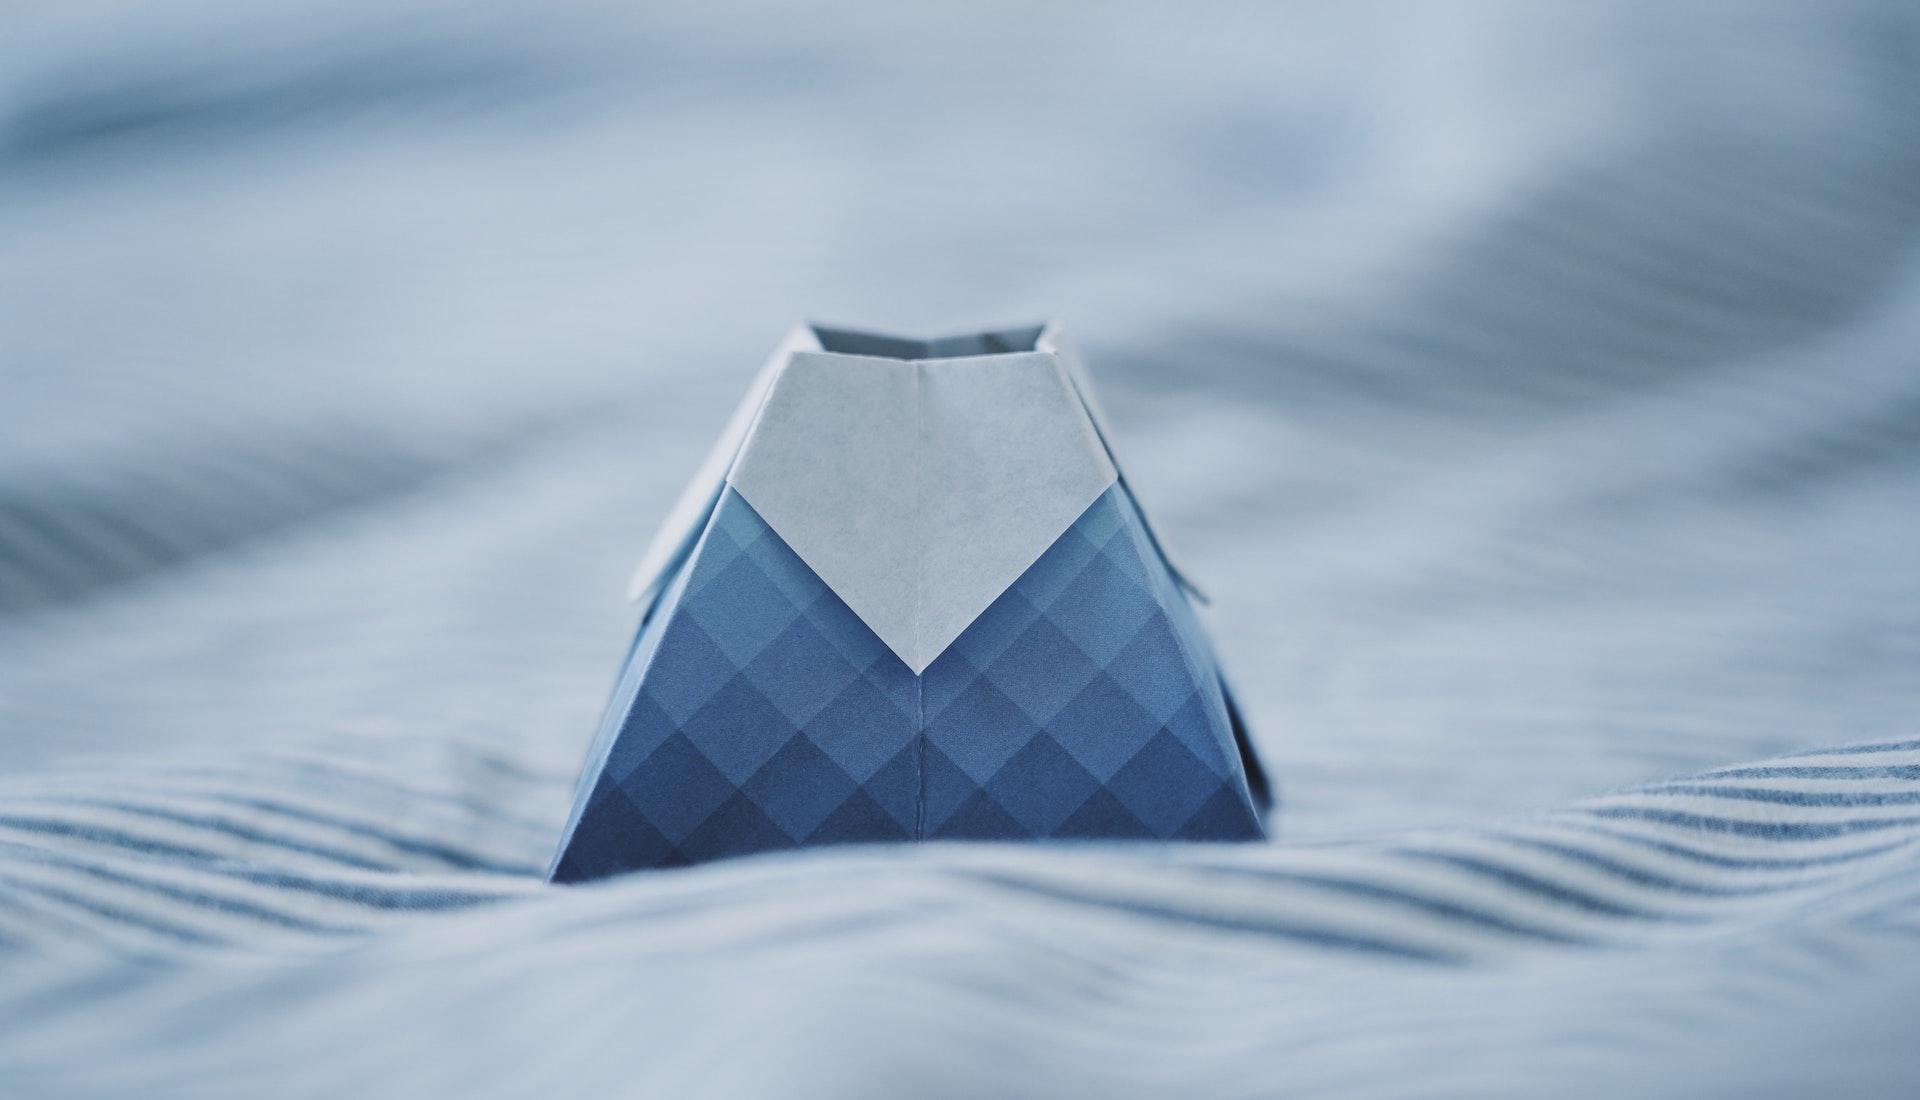 mountain-shaped origami